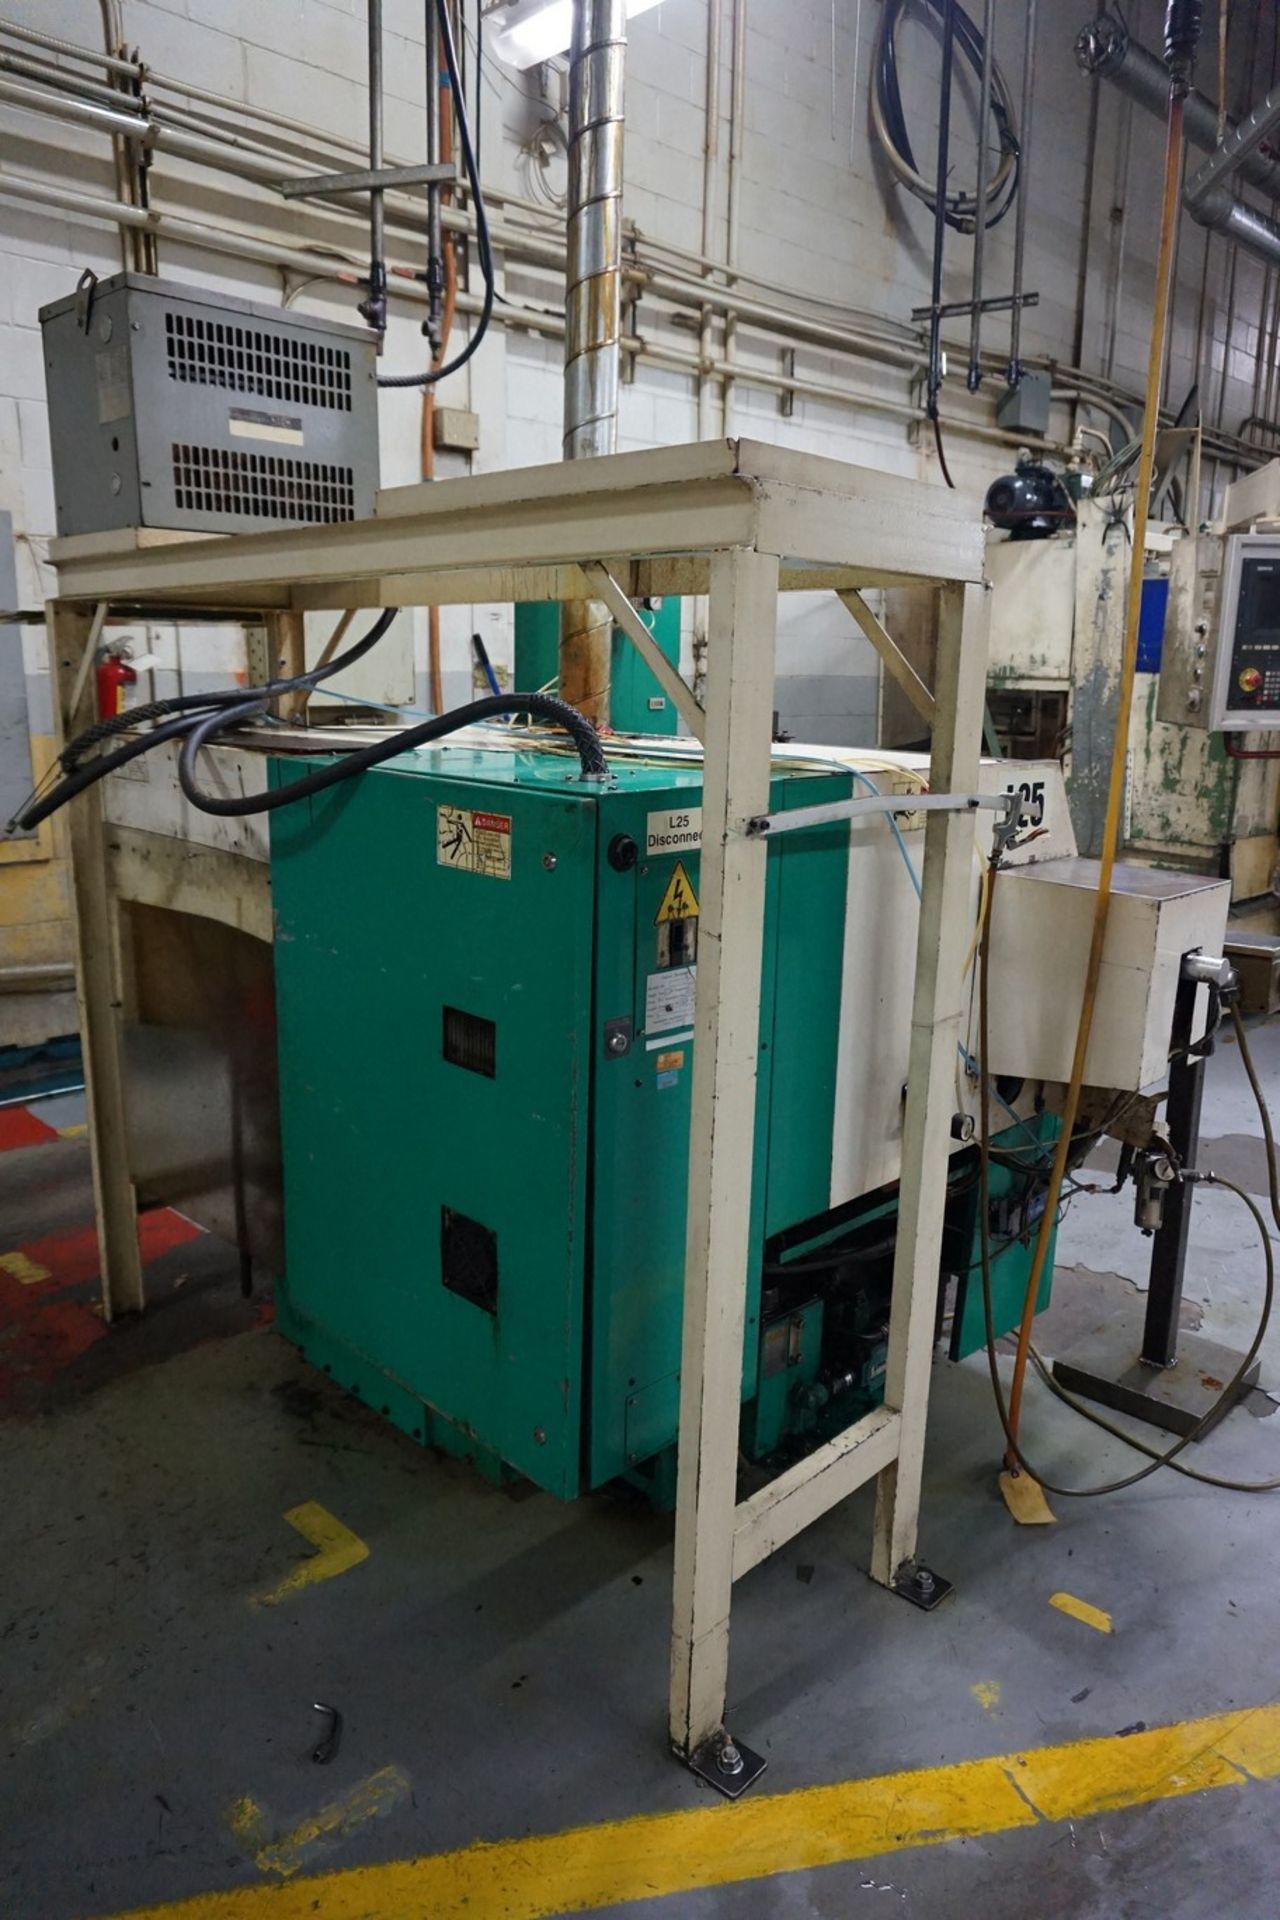 Takamatsu Model X10 CNC Lathe 200/220V c/w Chip Conveyor, Transformer - Image 5 of 6